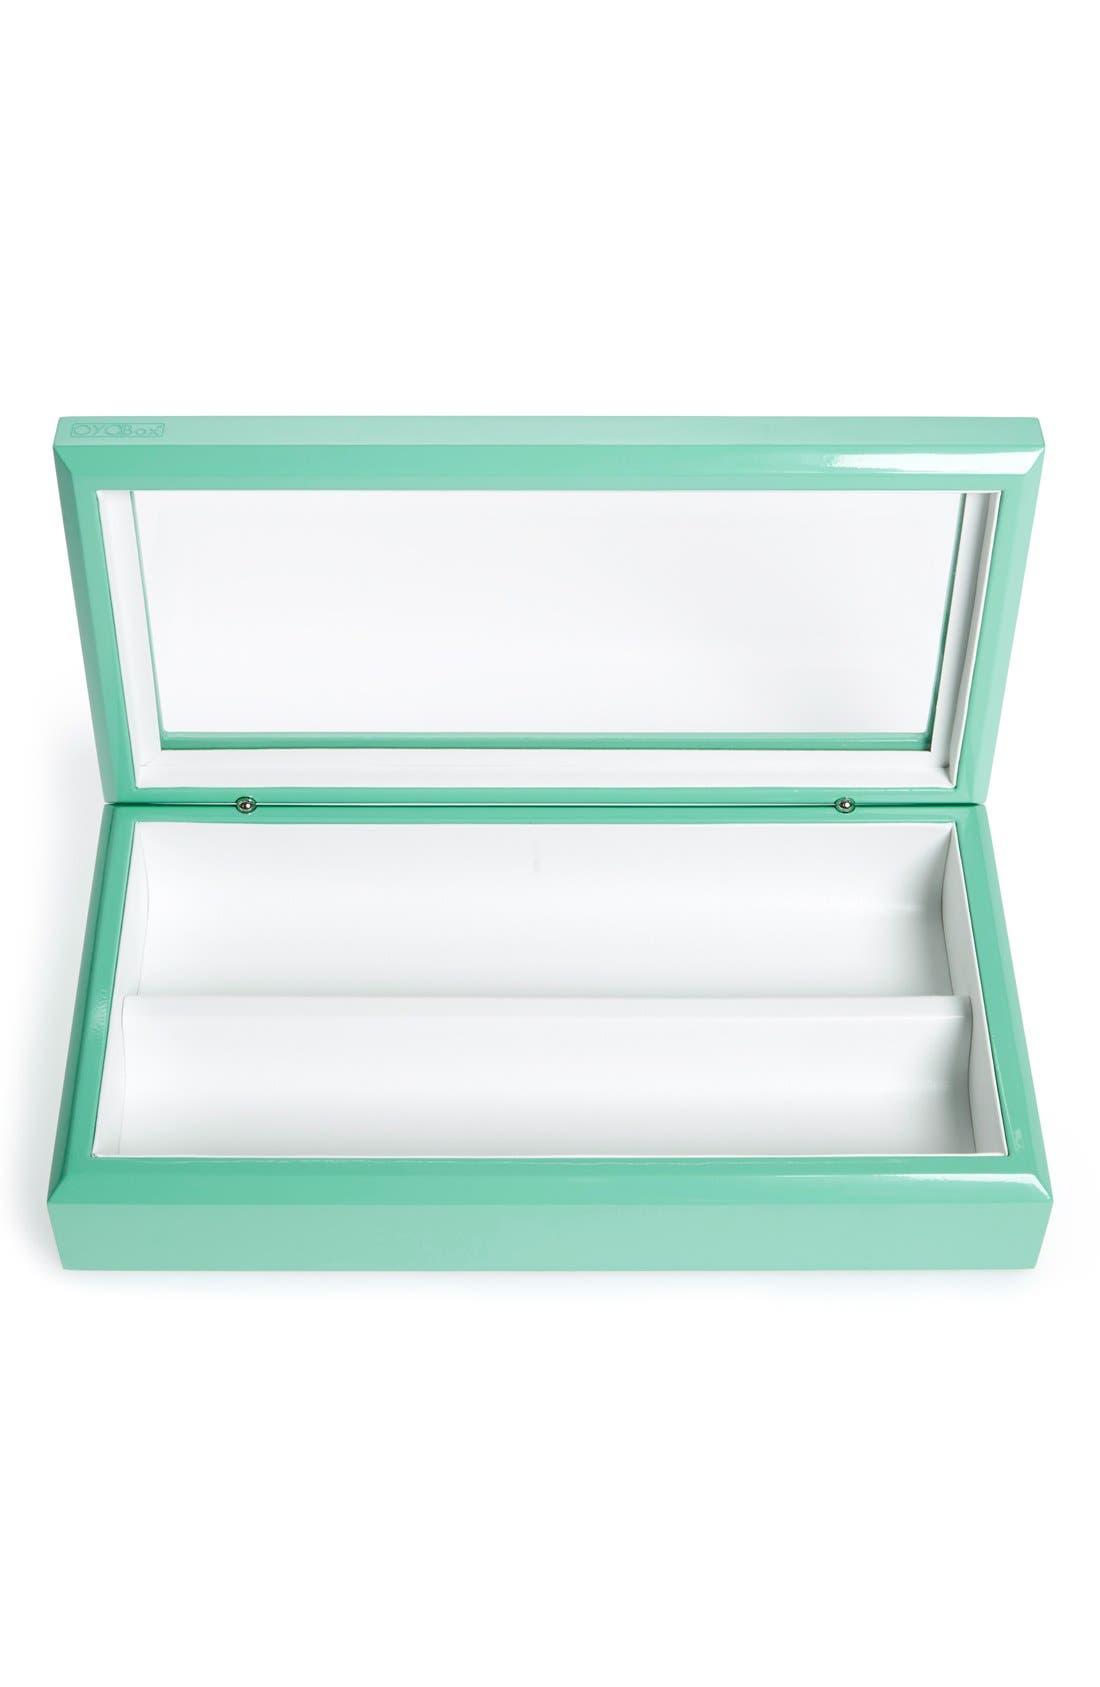 Lacquered Wood Window Top Eyewear Organizer Case,                             Alternate thumbnail 4, color,                             Aqua